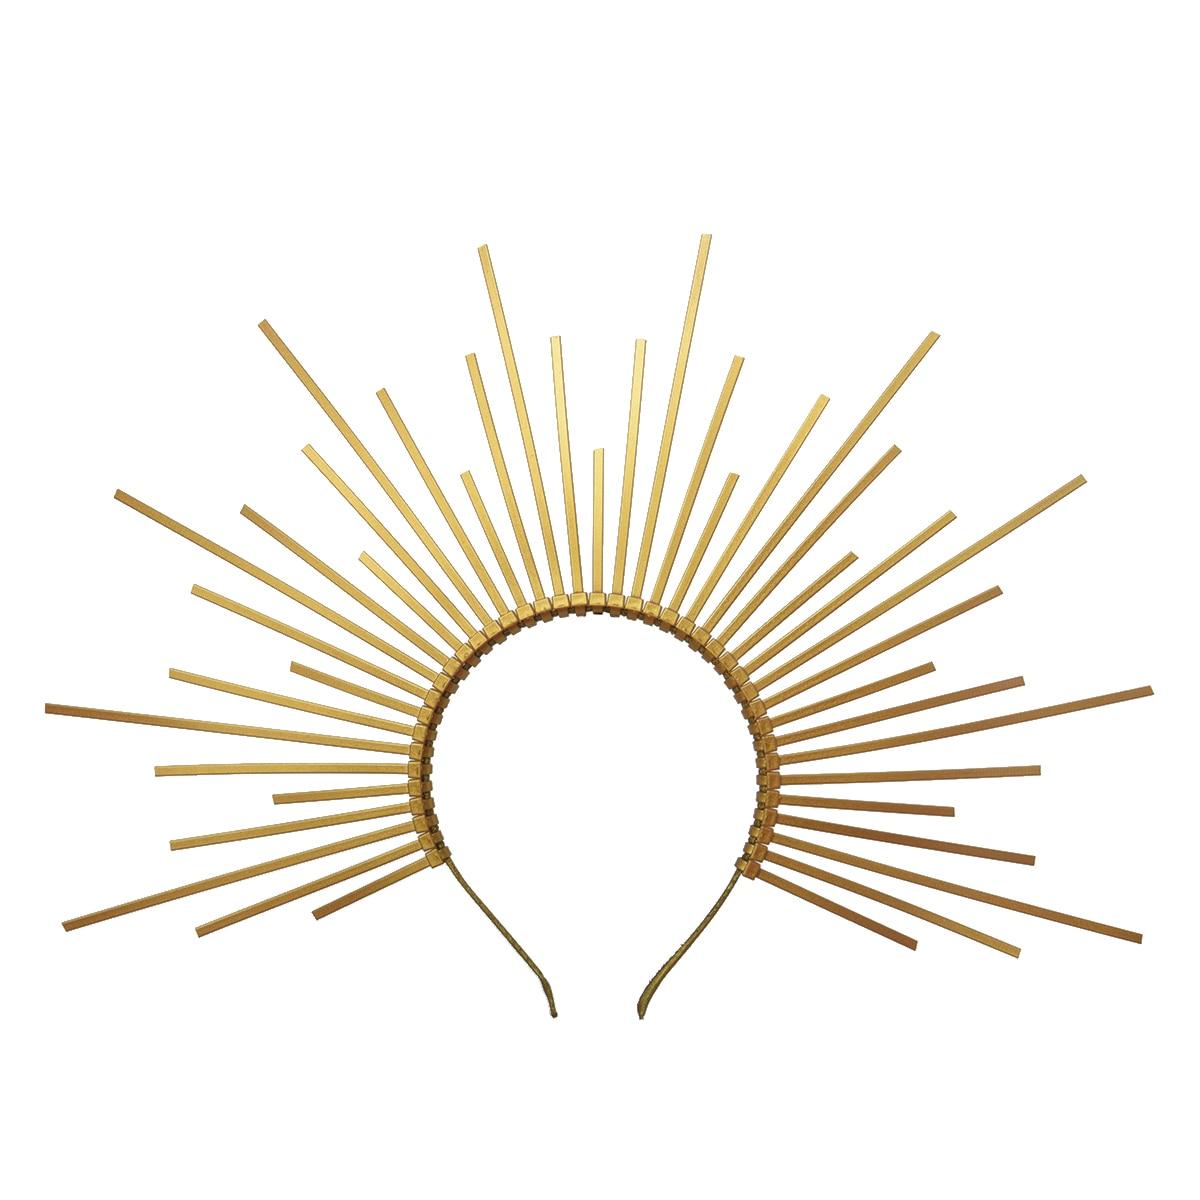 Gold Spike Halo Crown Headpiece PLASTIC ZIP TIE Elf Wedding Bride Hair Band Women Headband Headdress